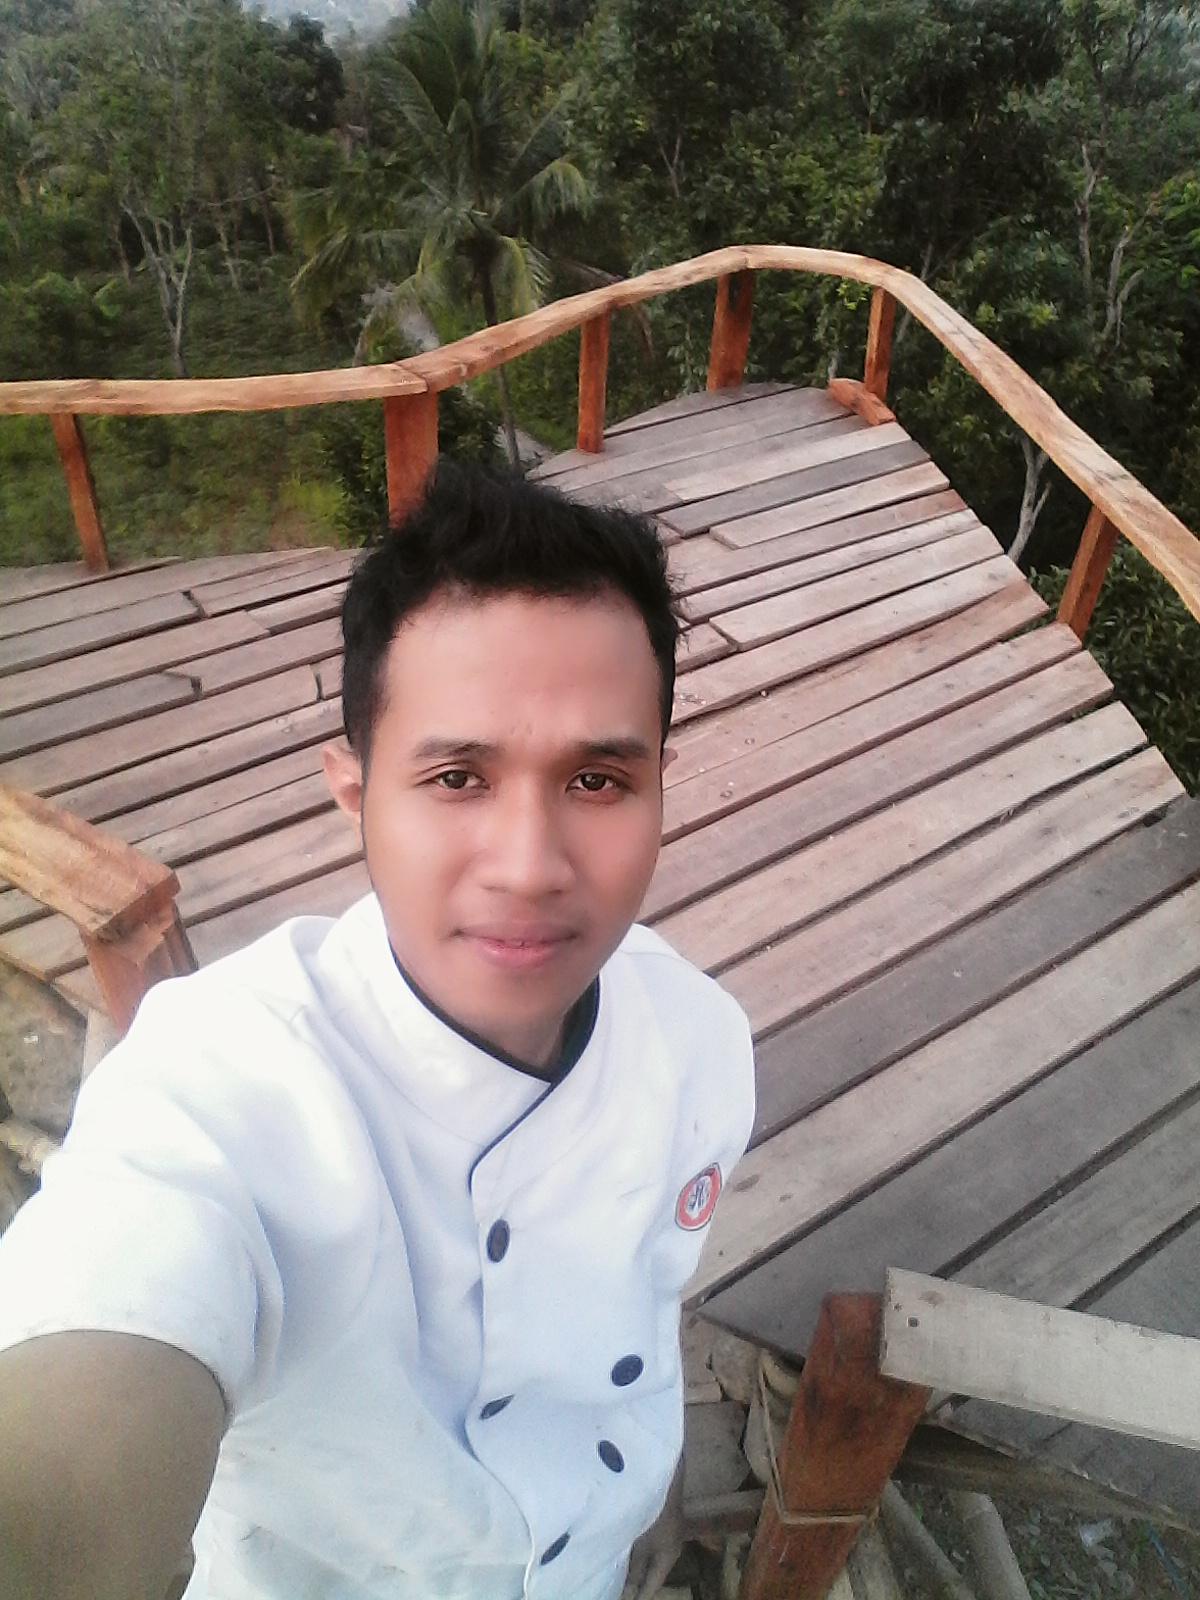 My Tasik Eksis Bukit Love Saritem Cineam Swafoto Kekinian Di